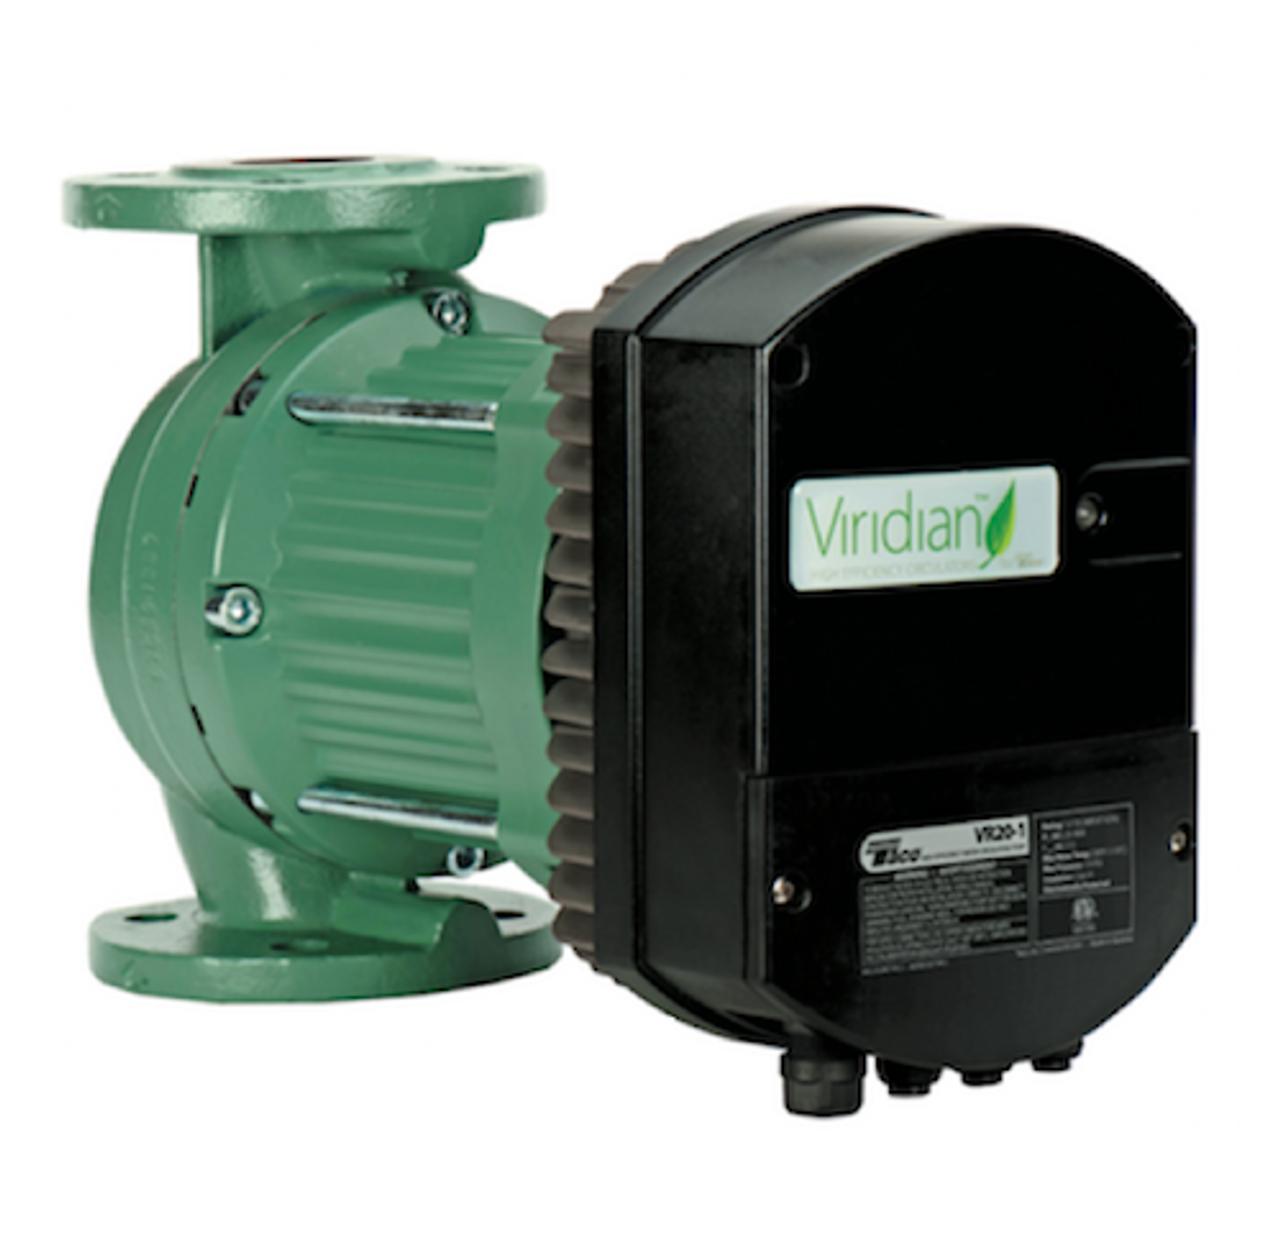 taco controls wiring 975 420rp taco viridian pump wiring connector kit national pump  taco viridian pump wiring connector kit